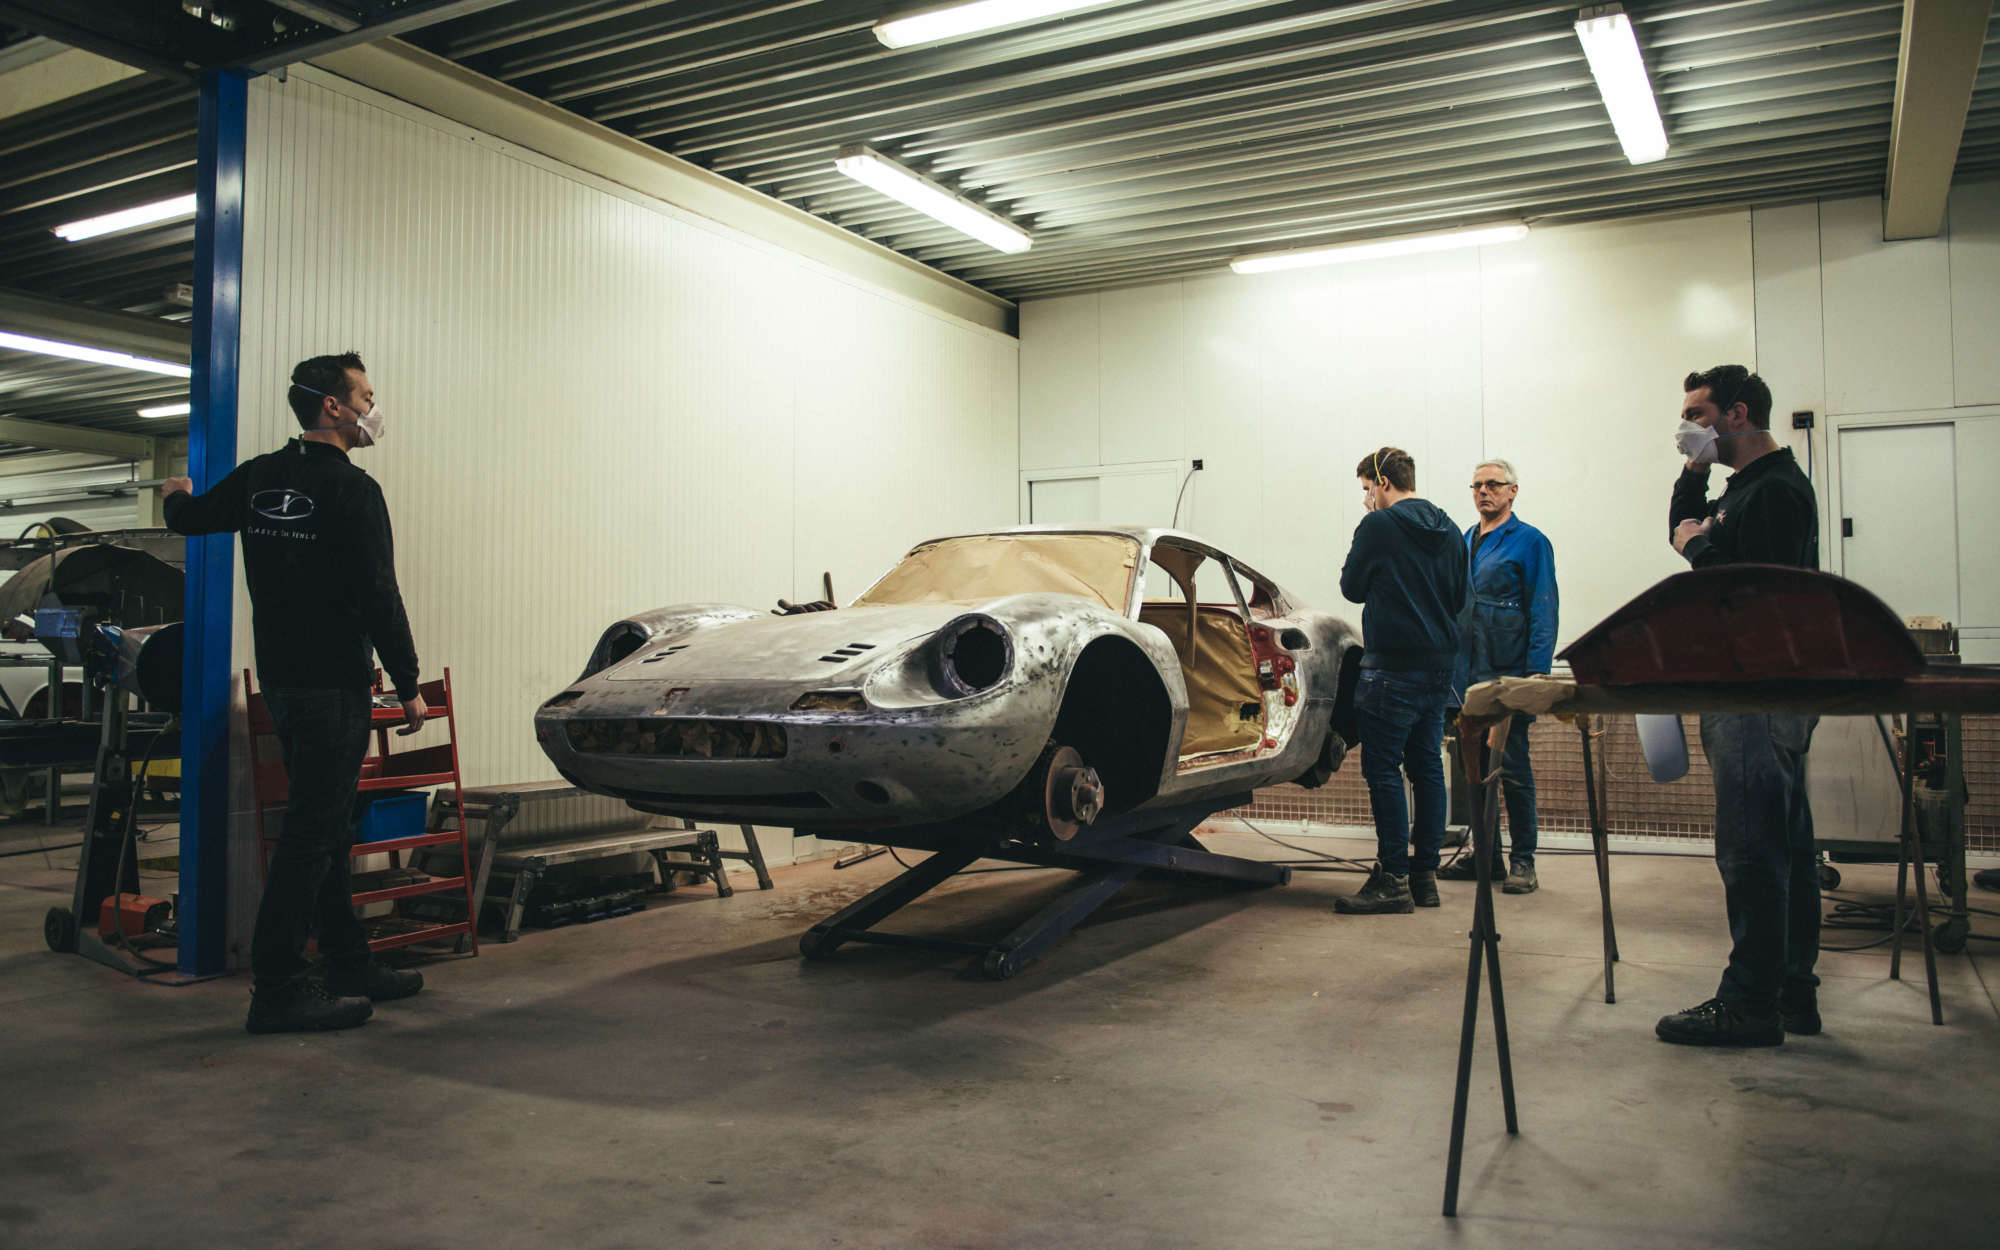 Classic Car Venlo bodywork header image 6000x3750